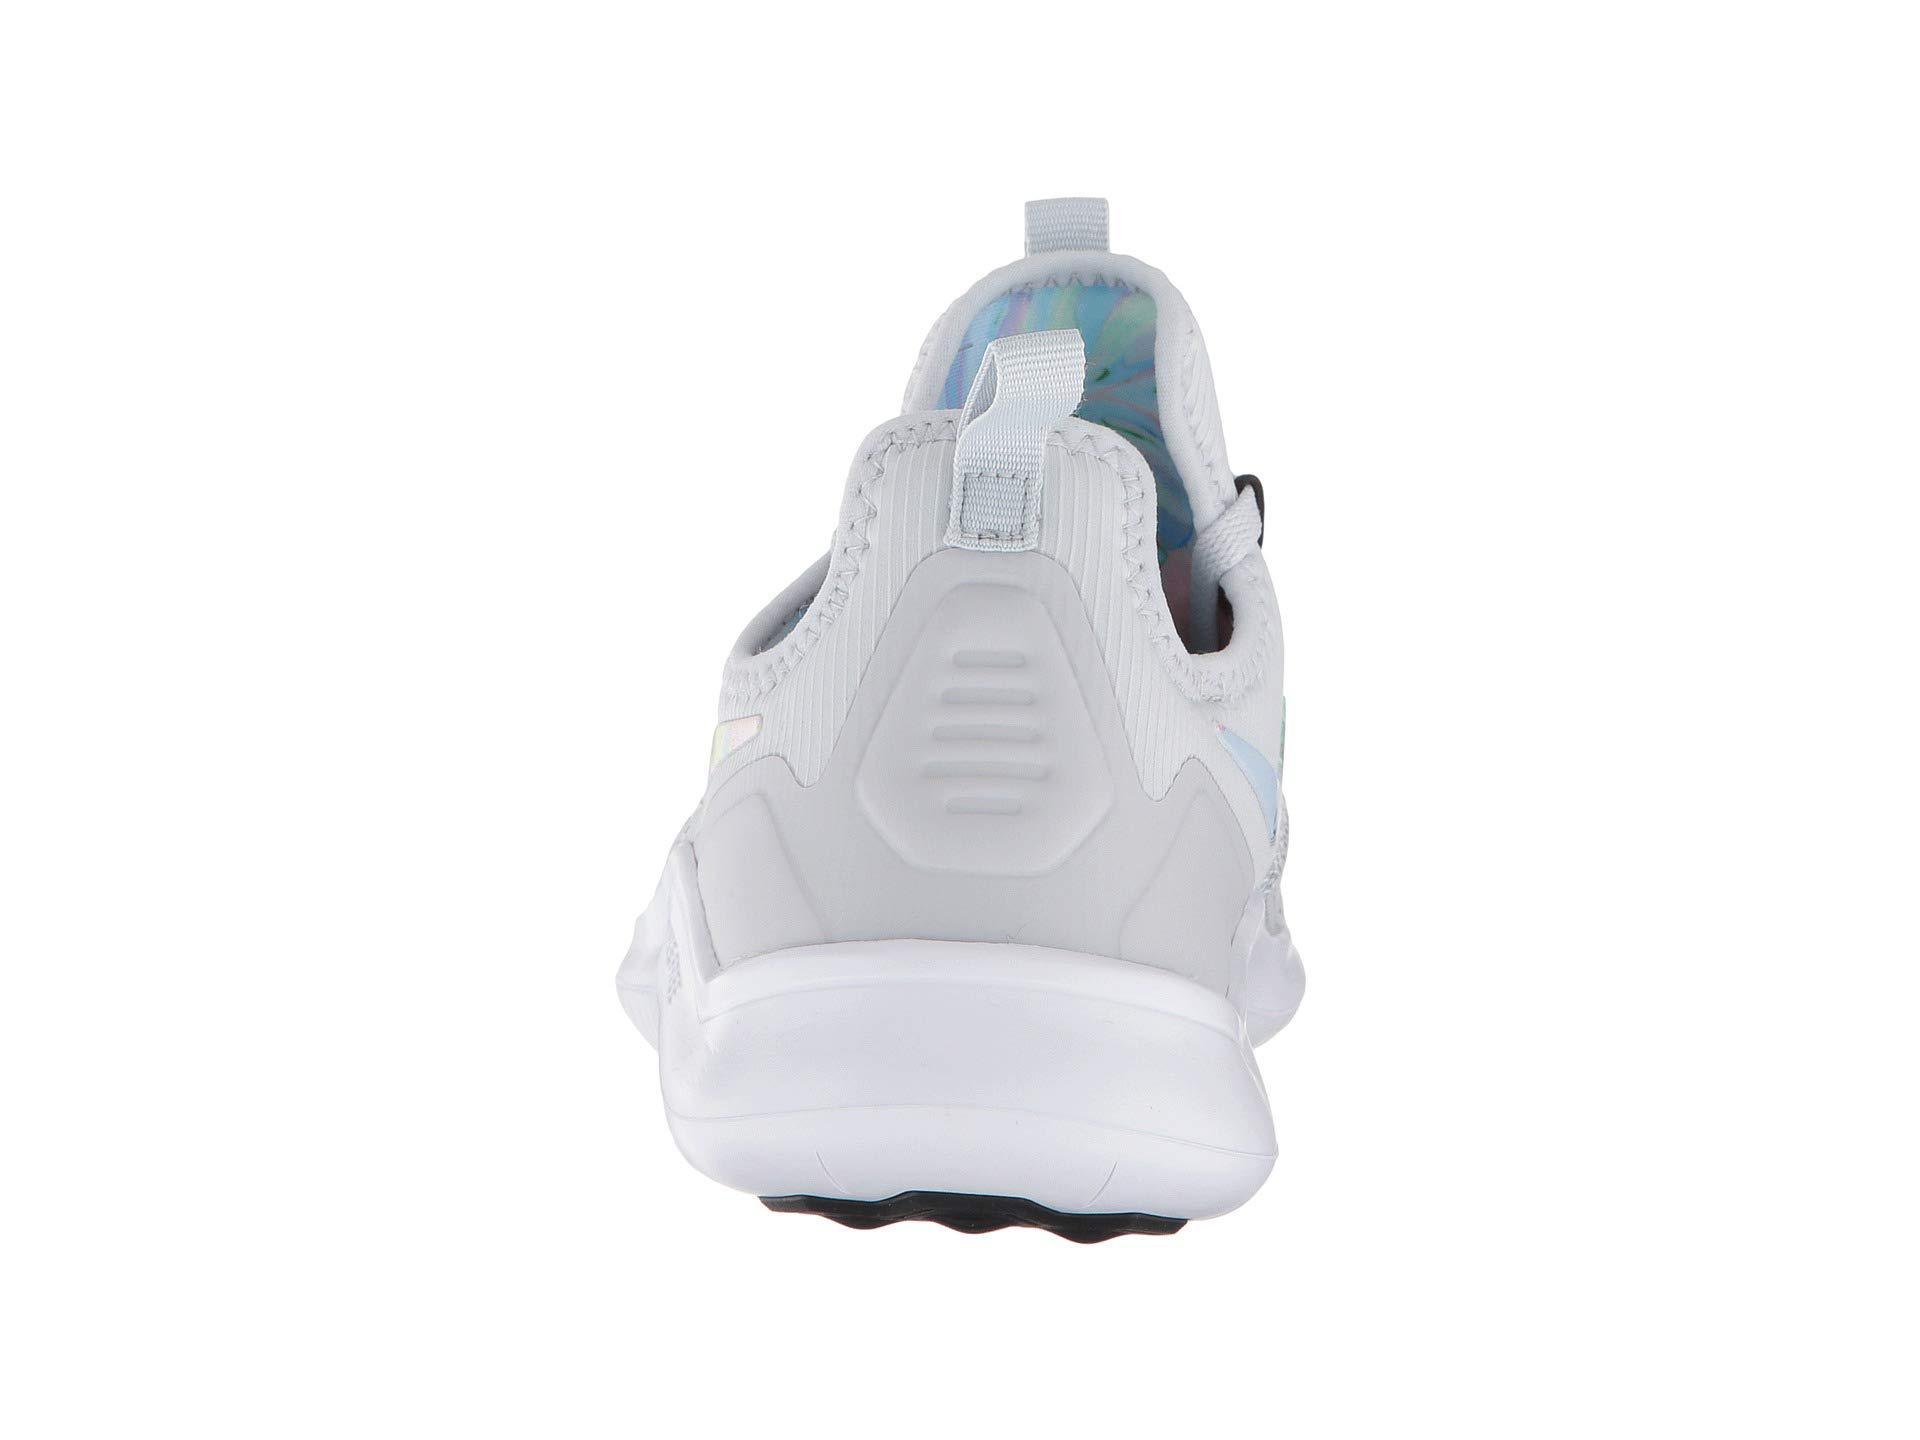 Shop Nike Women's Lunarglide + 3 Breathe Pure PlatinumWhite